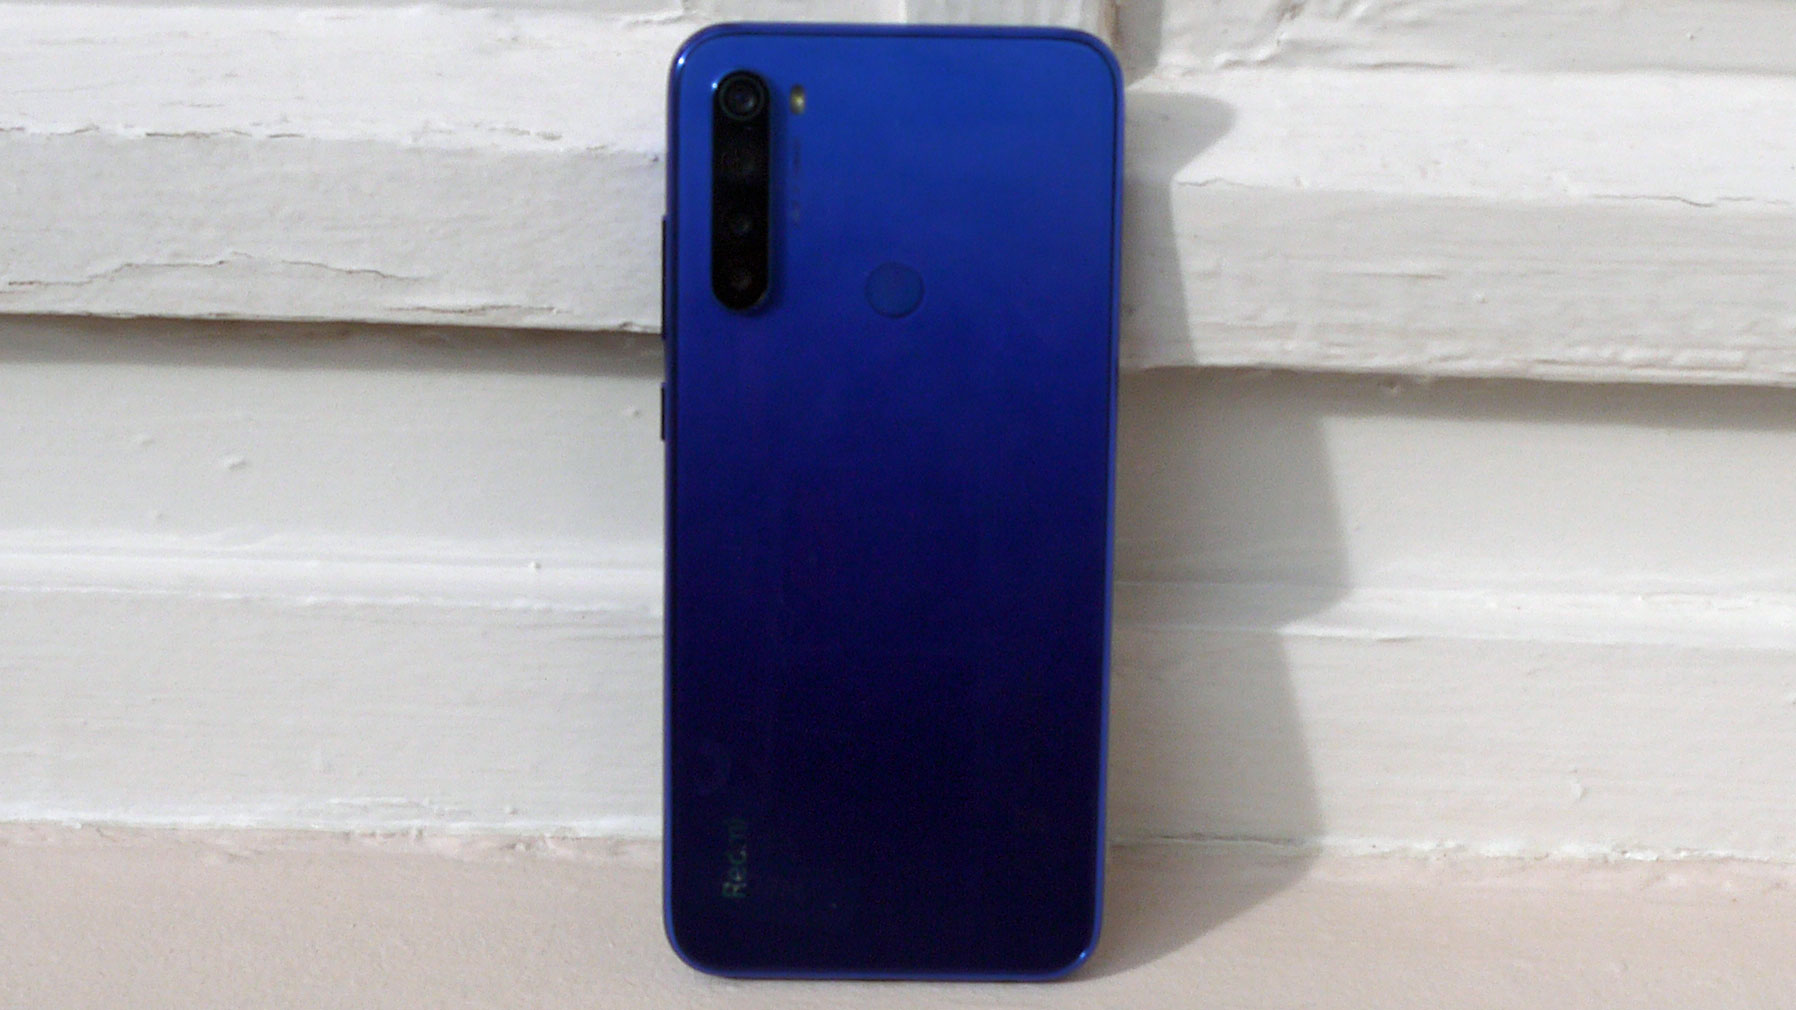 Hands on: Xiaomi Redmi Note 8T review | TechRadar